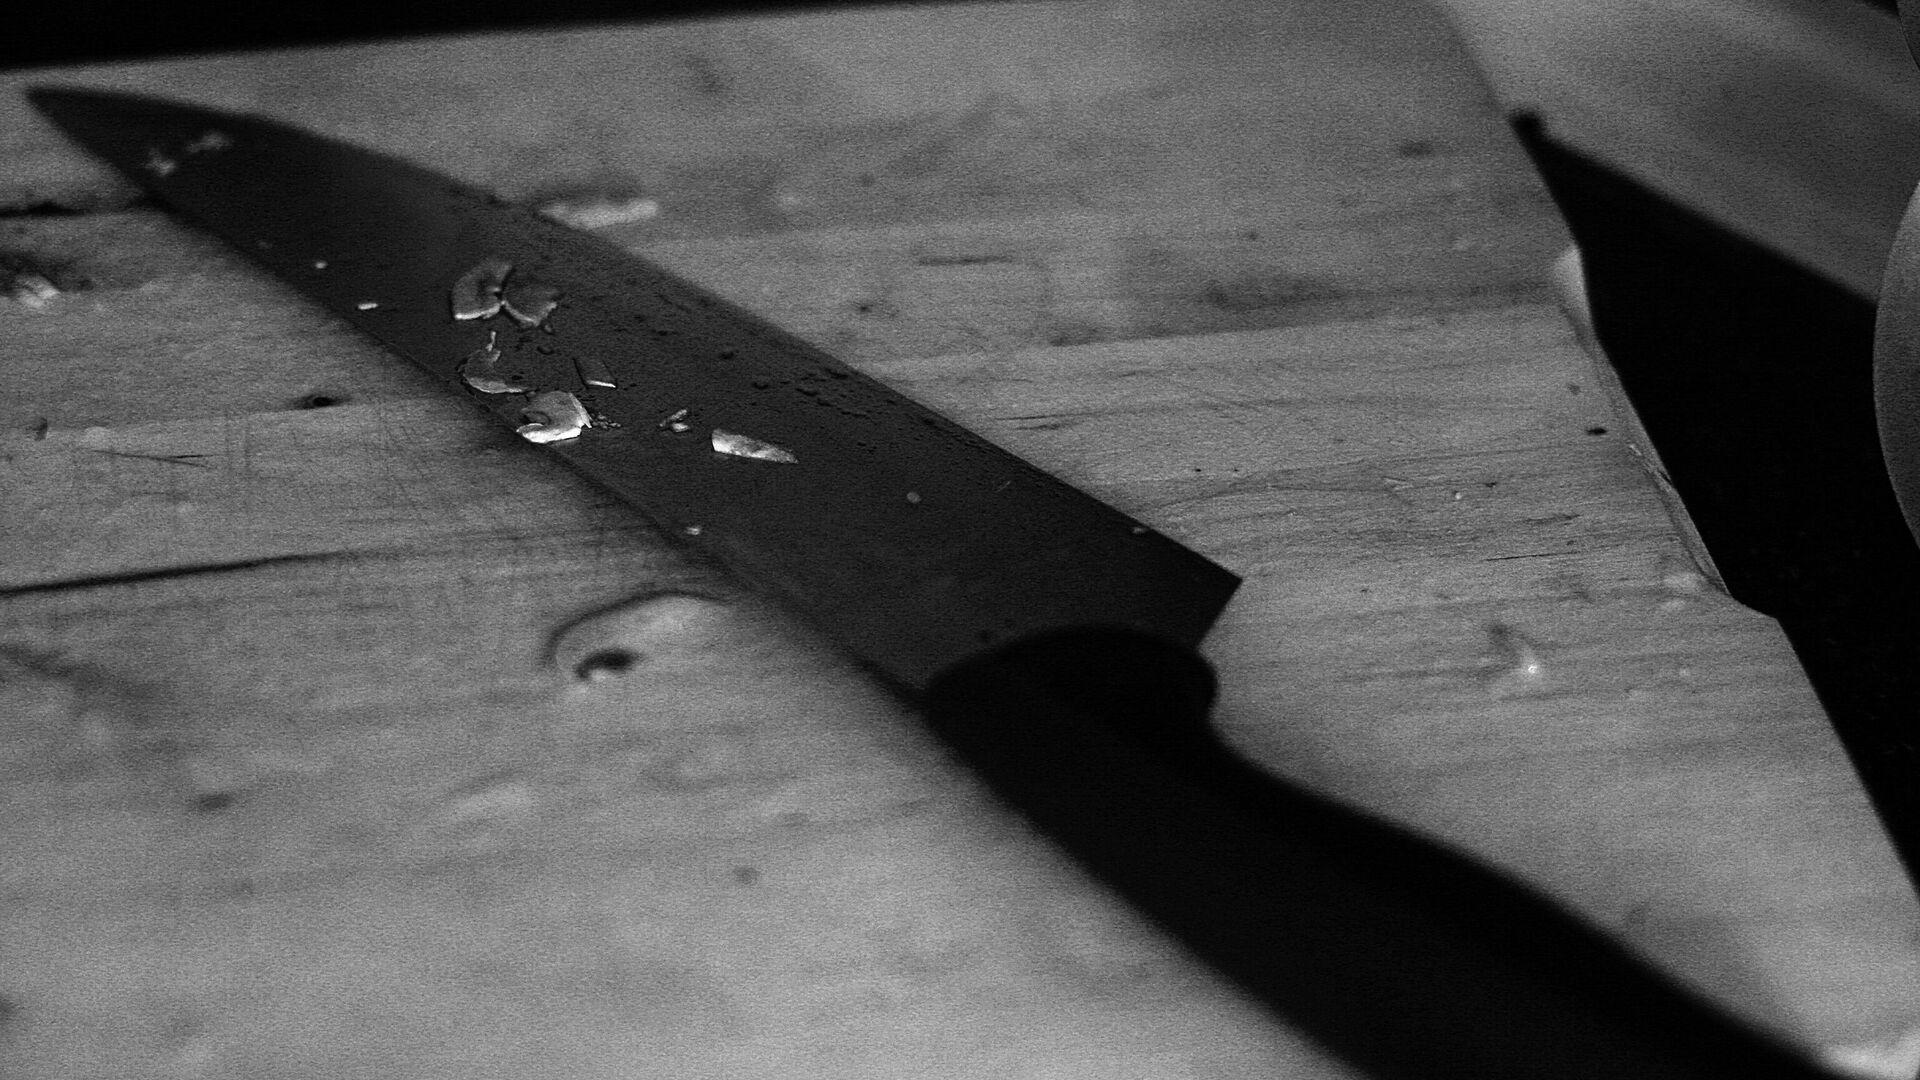 Cuchillo de cocina - Sputnik Mundo, 1920, 05.06.2021